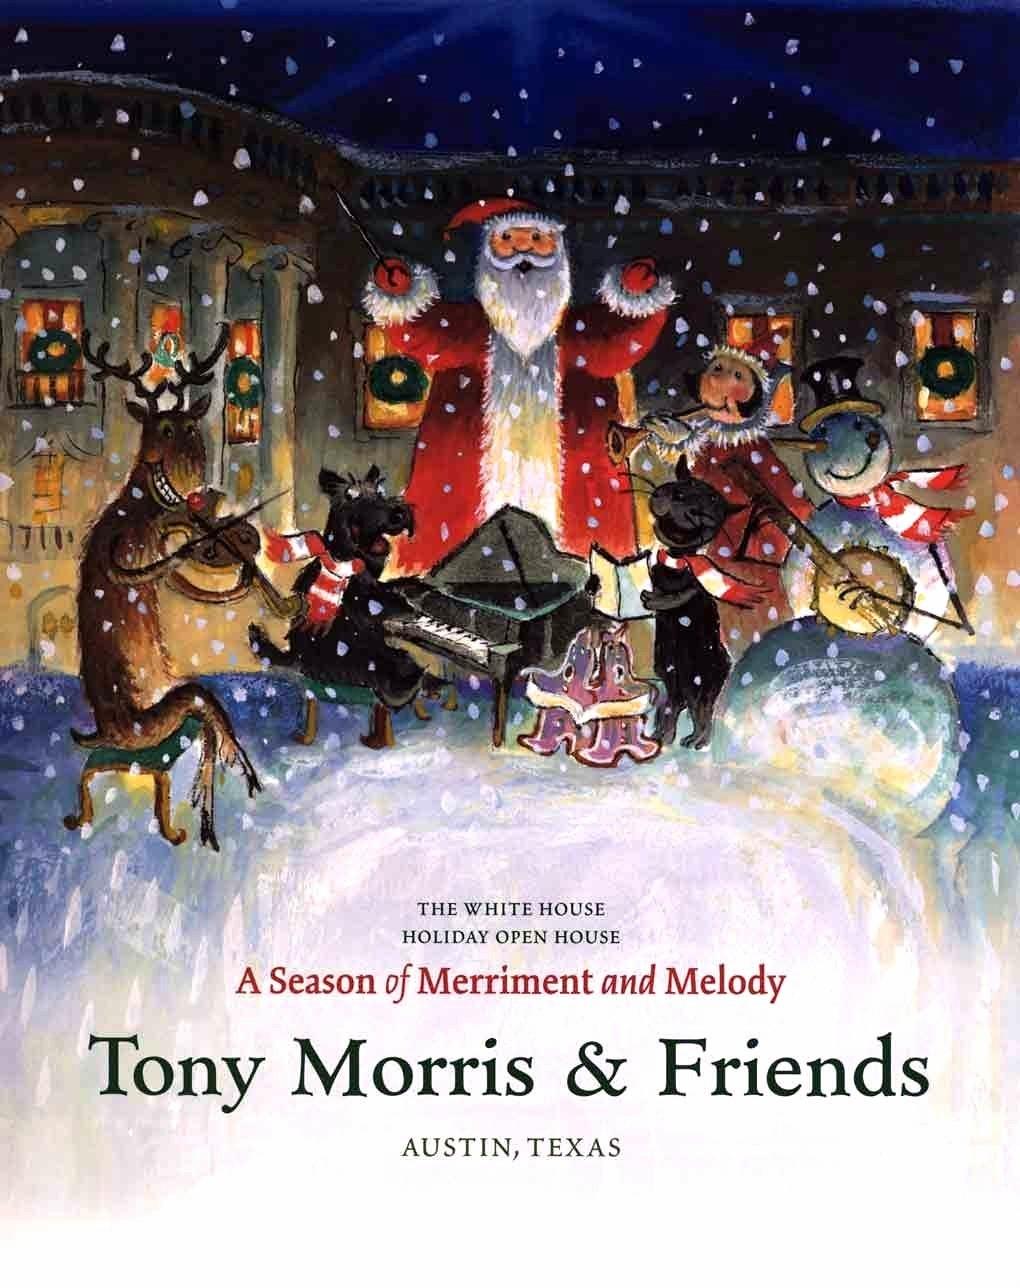 Caption: Tony Morris & Friends 2004 White House Christmas sign, Credit: Tony Morris